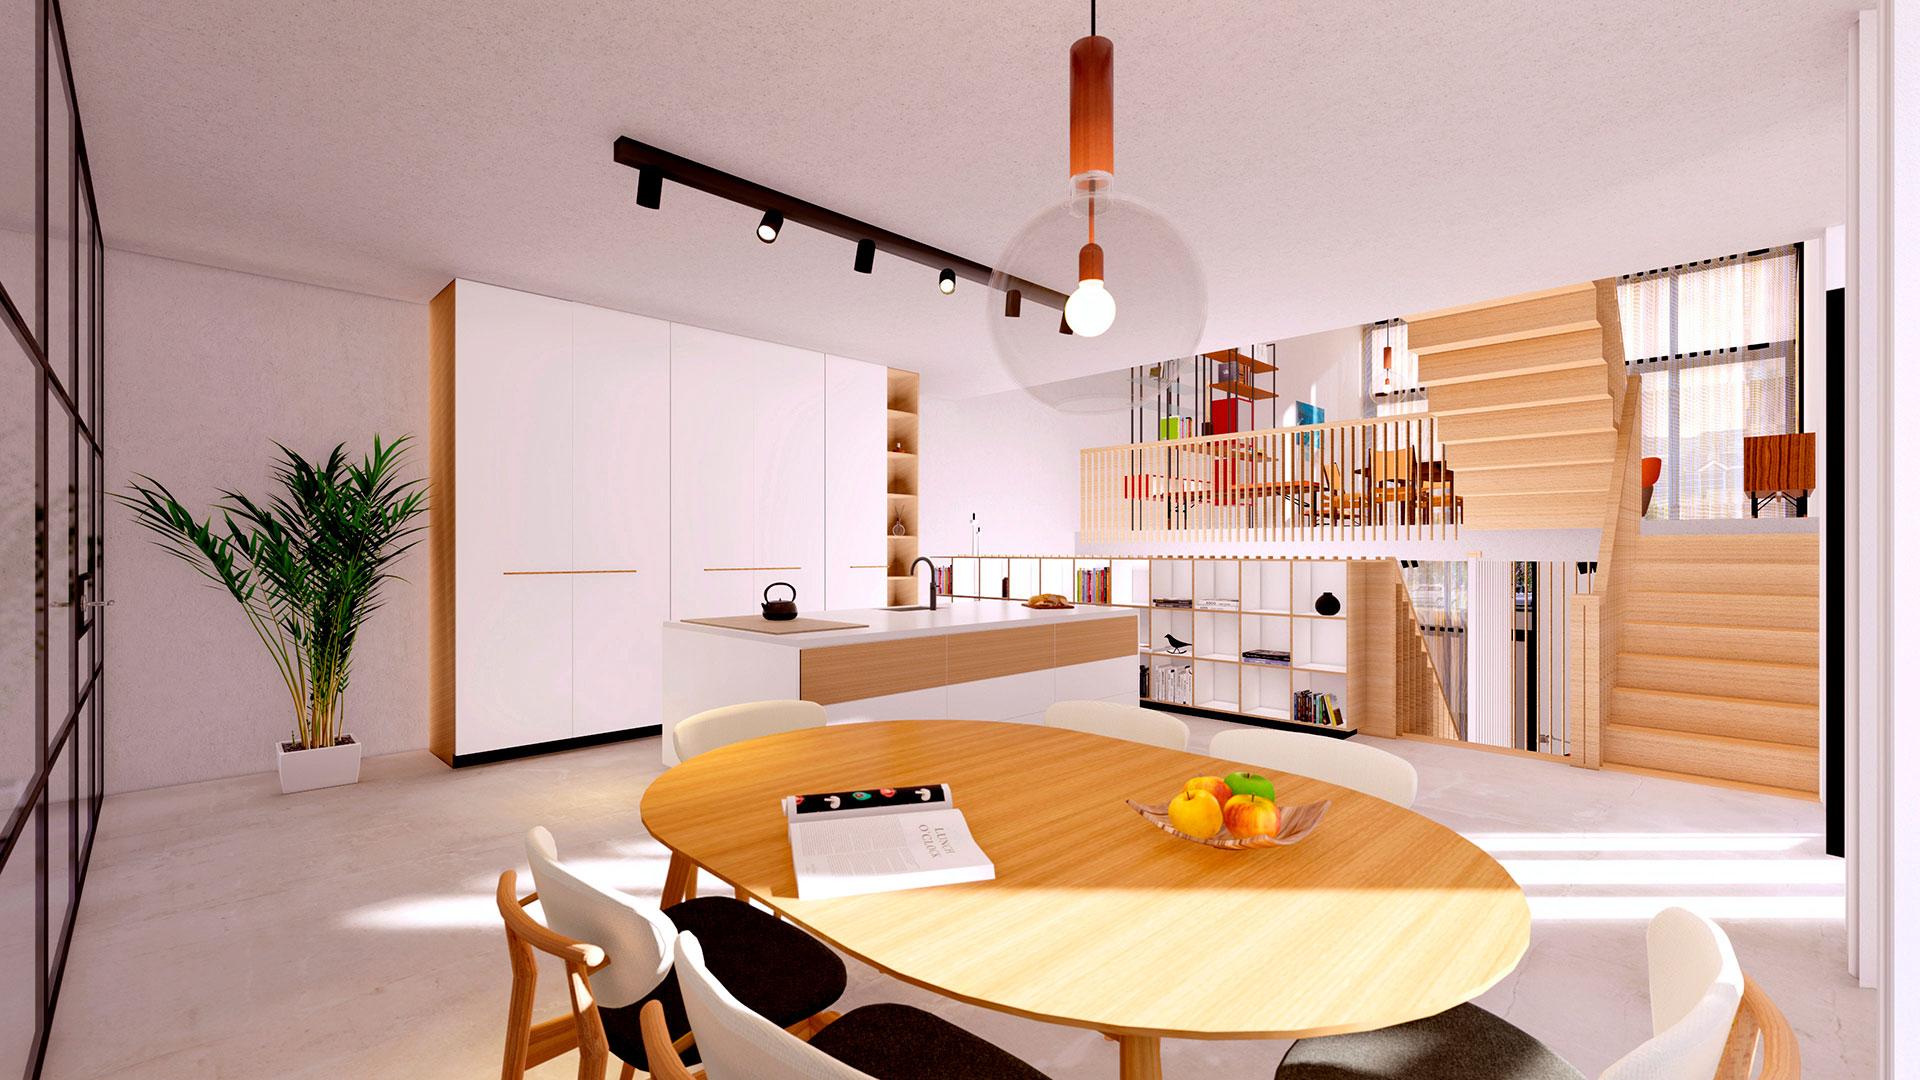 nexis-urban-villas-keuken.jpg